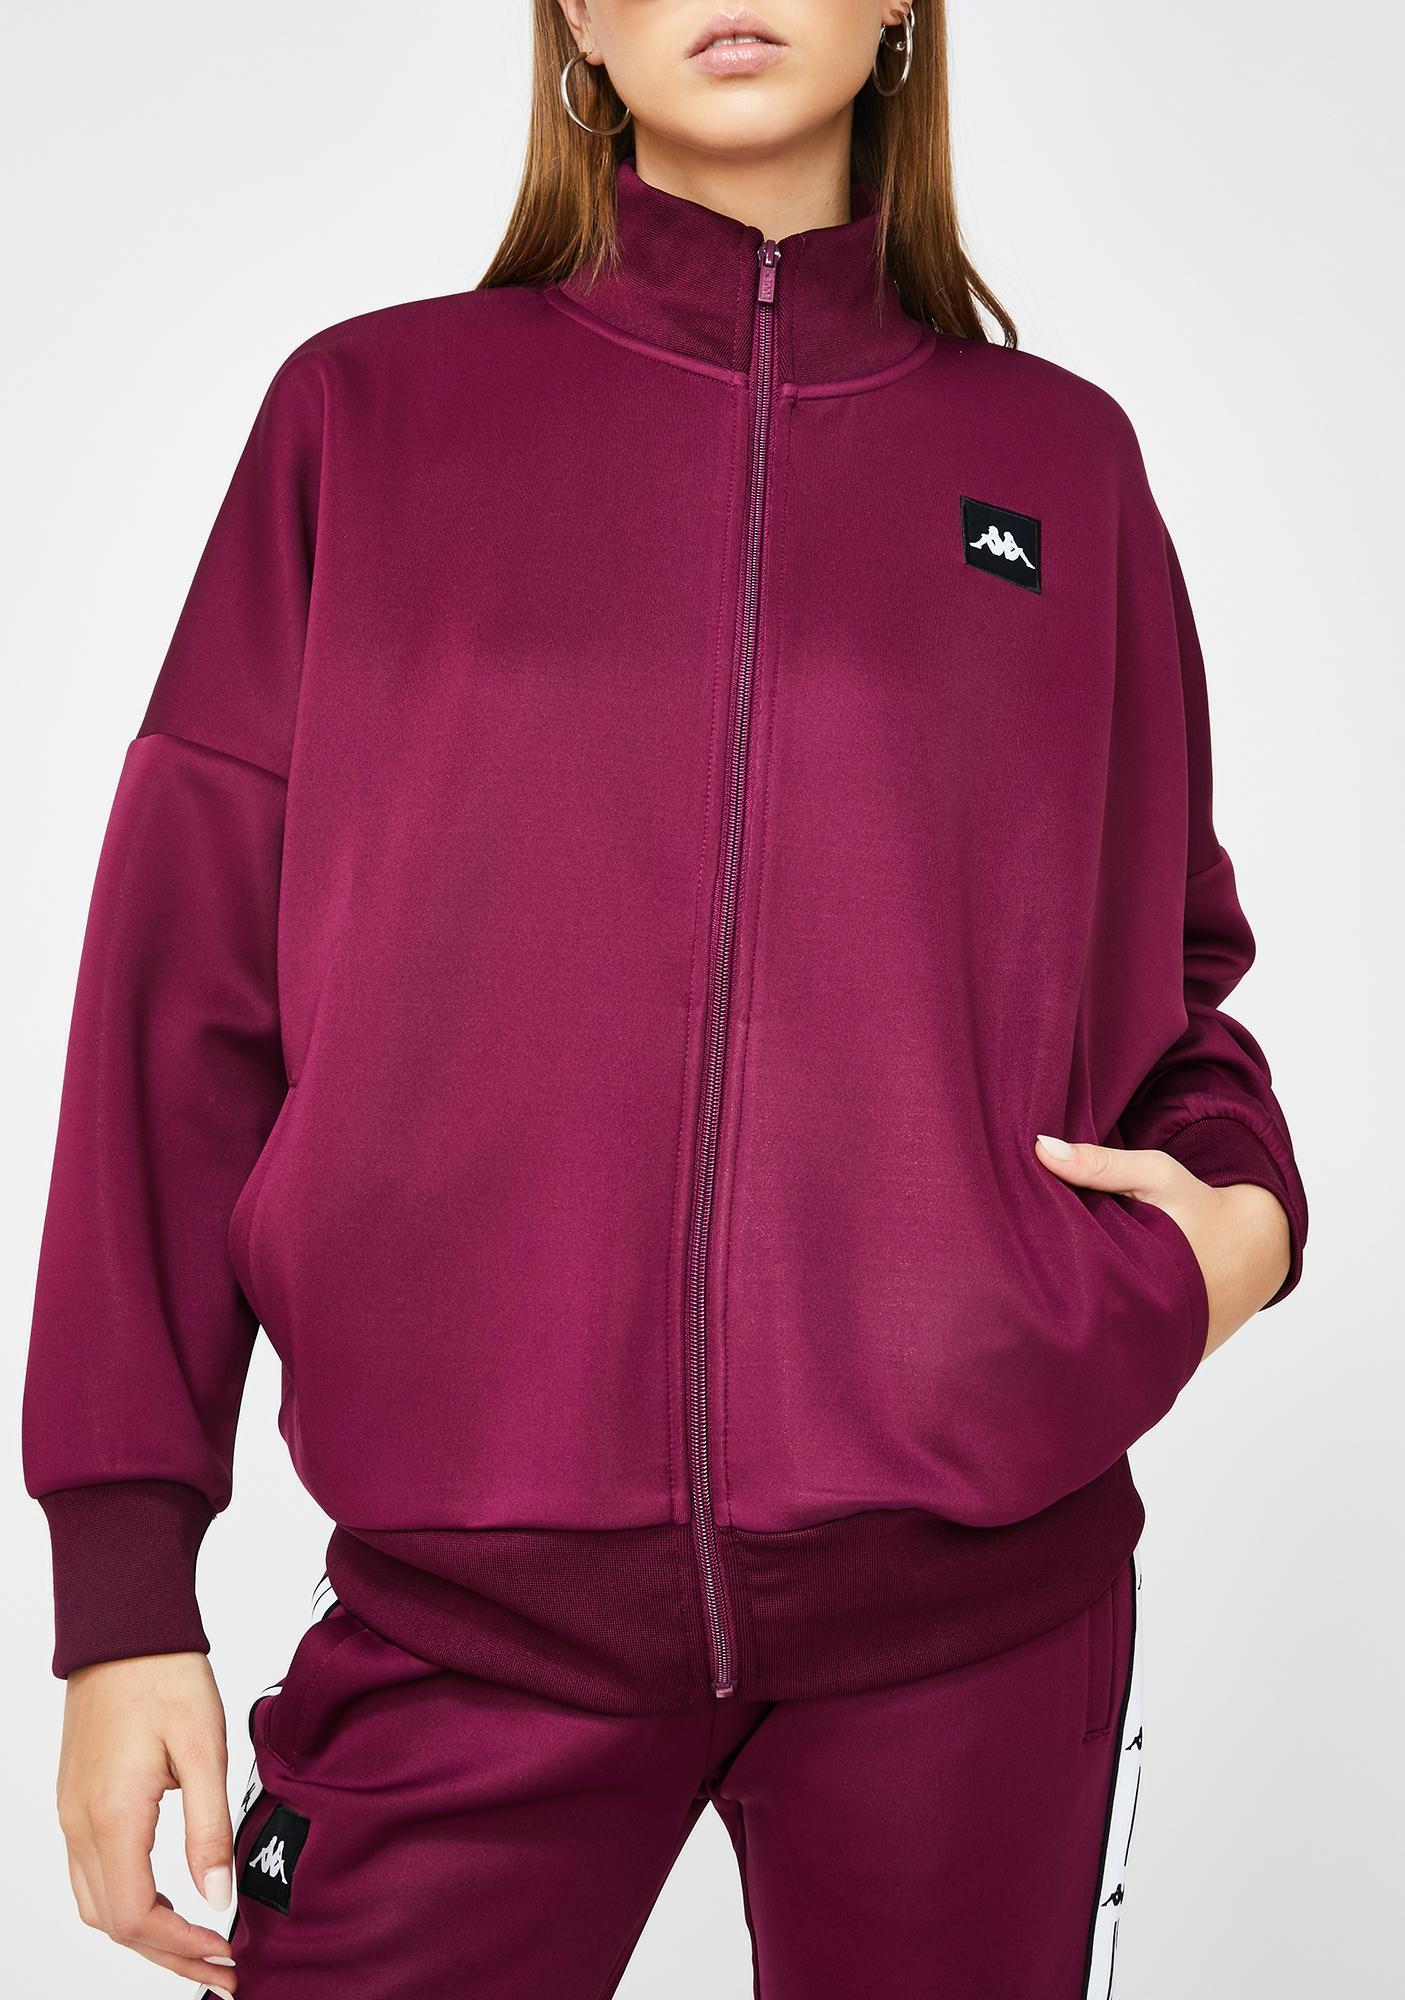 Kappa Authentic Jpn Bancu Track Jacket